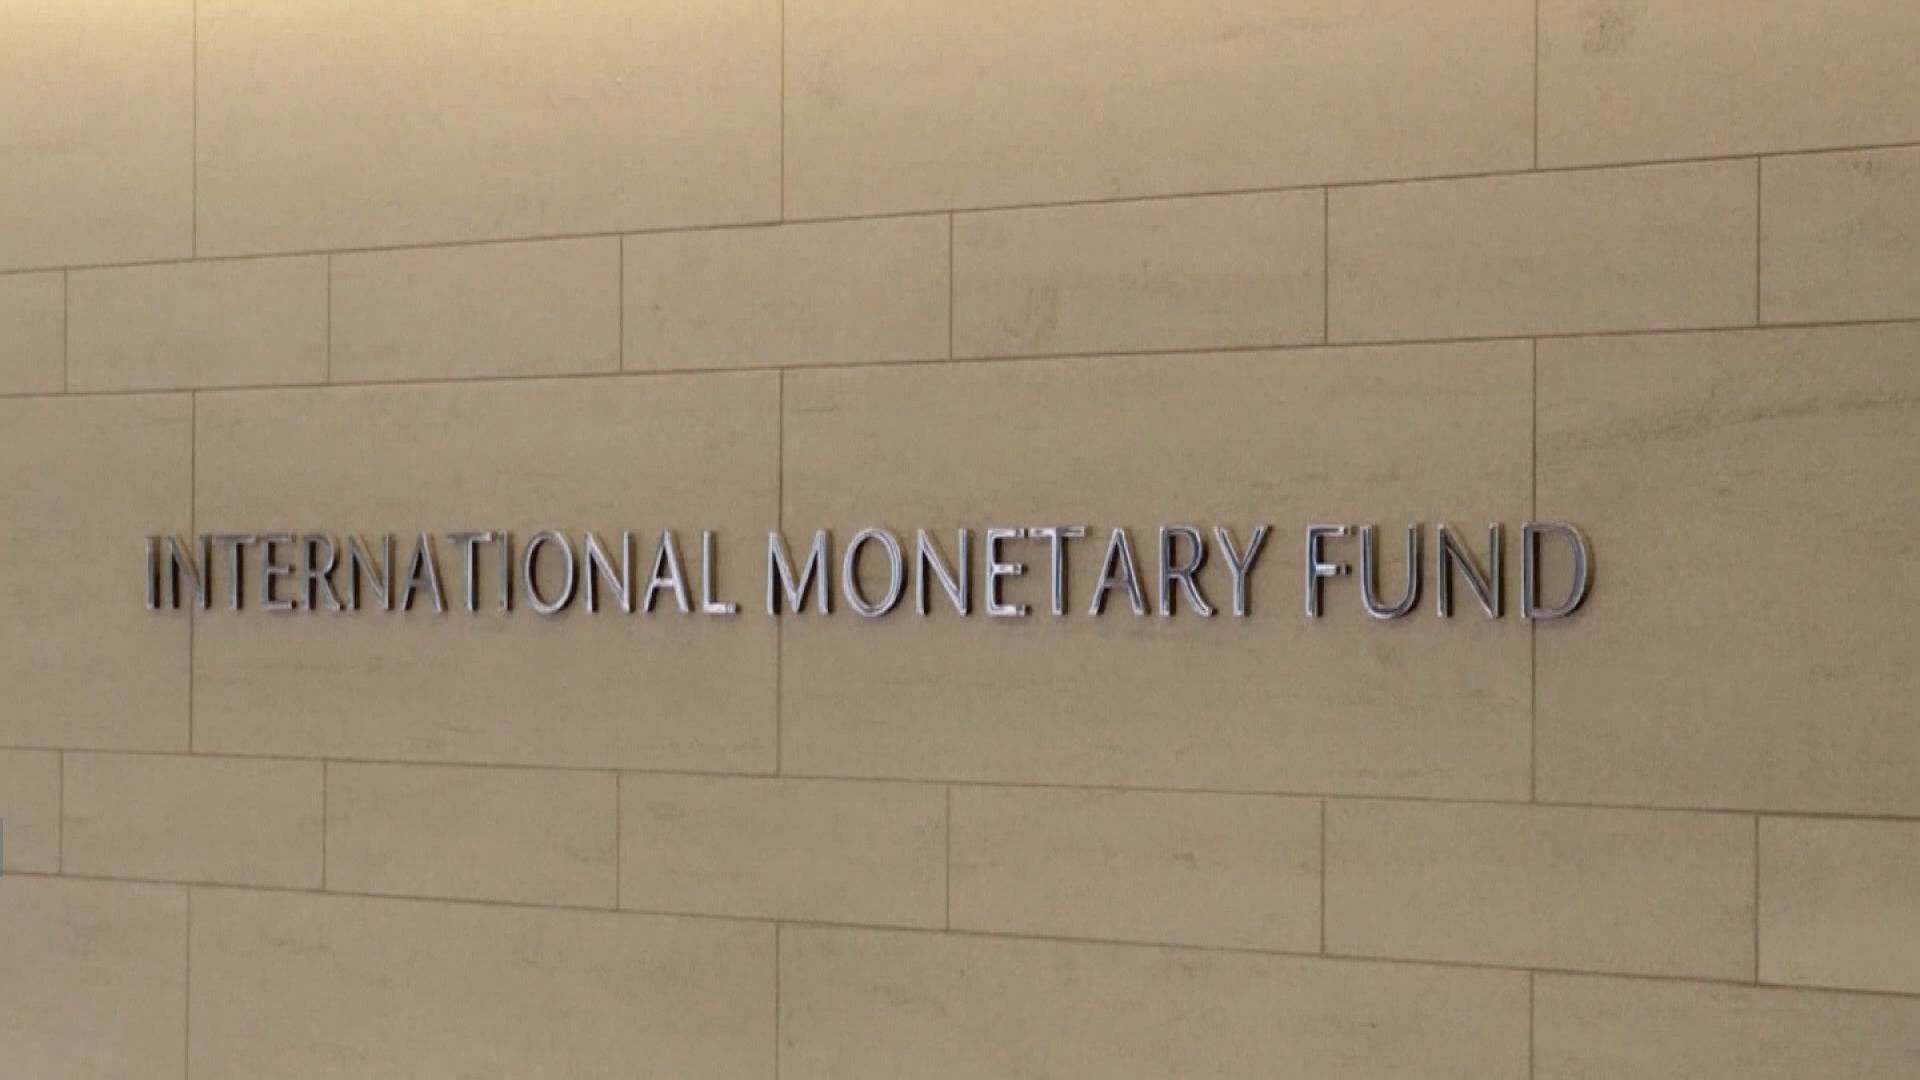 IMF促請各國維持財政支持 直至經濟復甦站穩陣腳